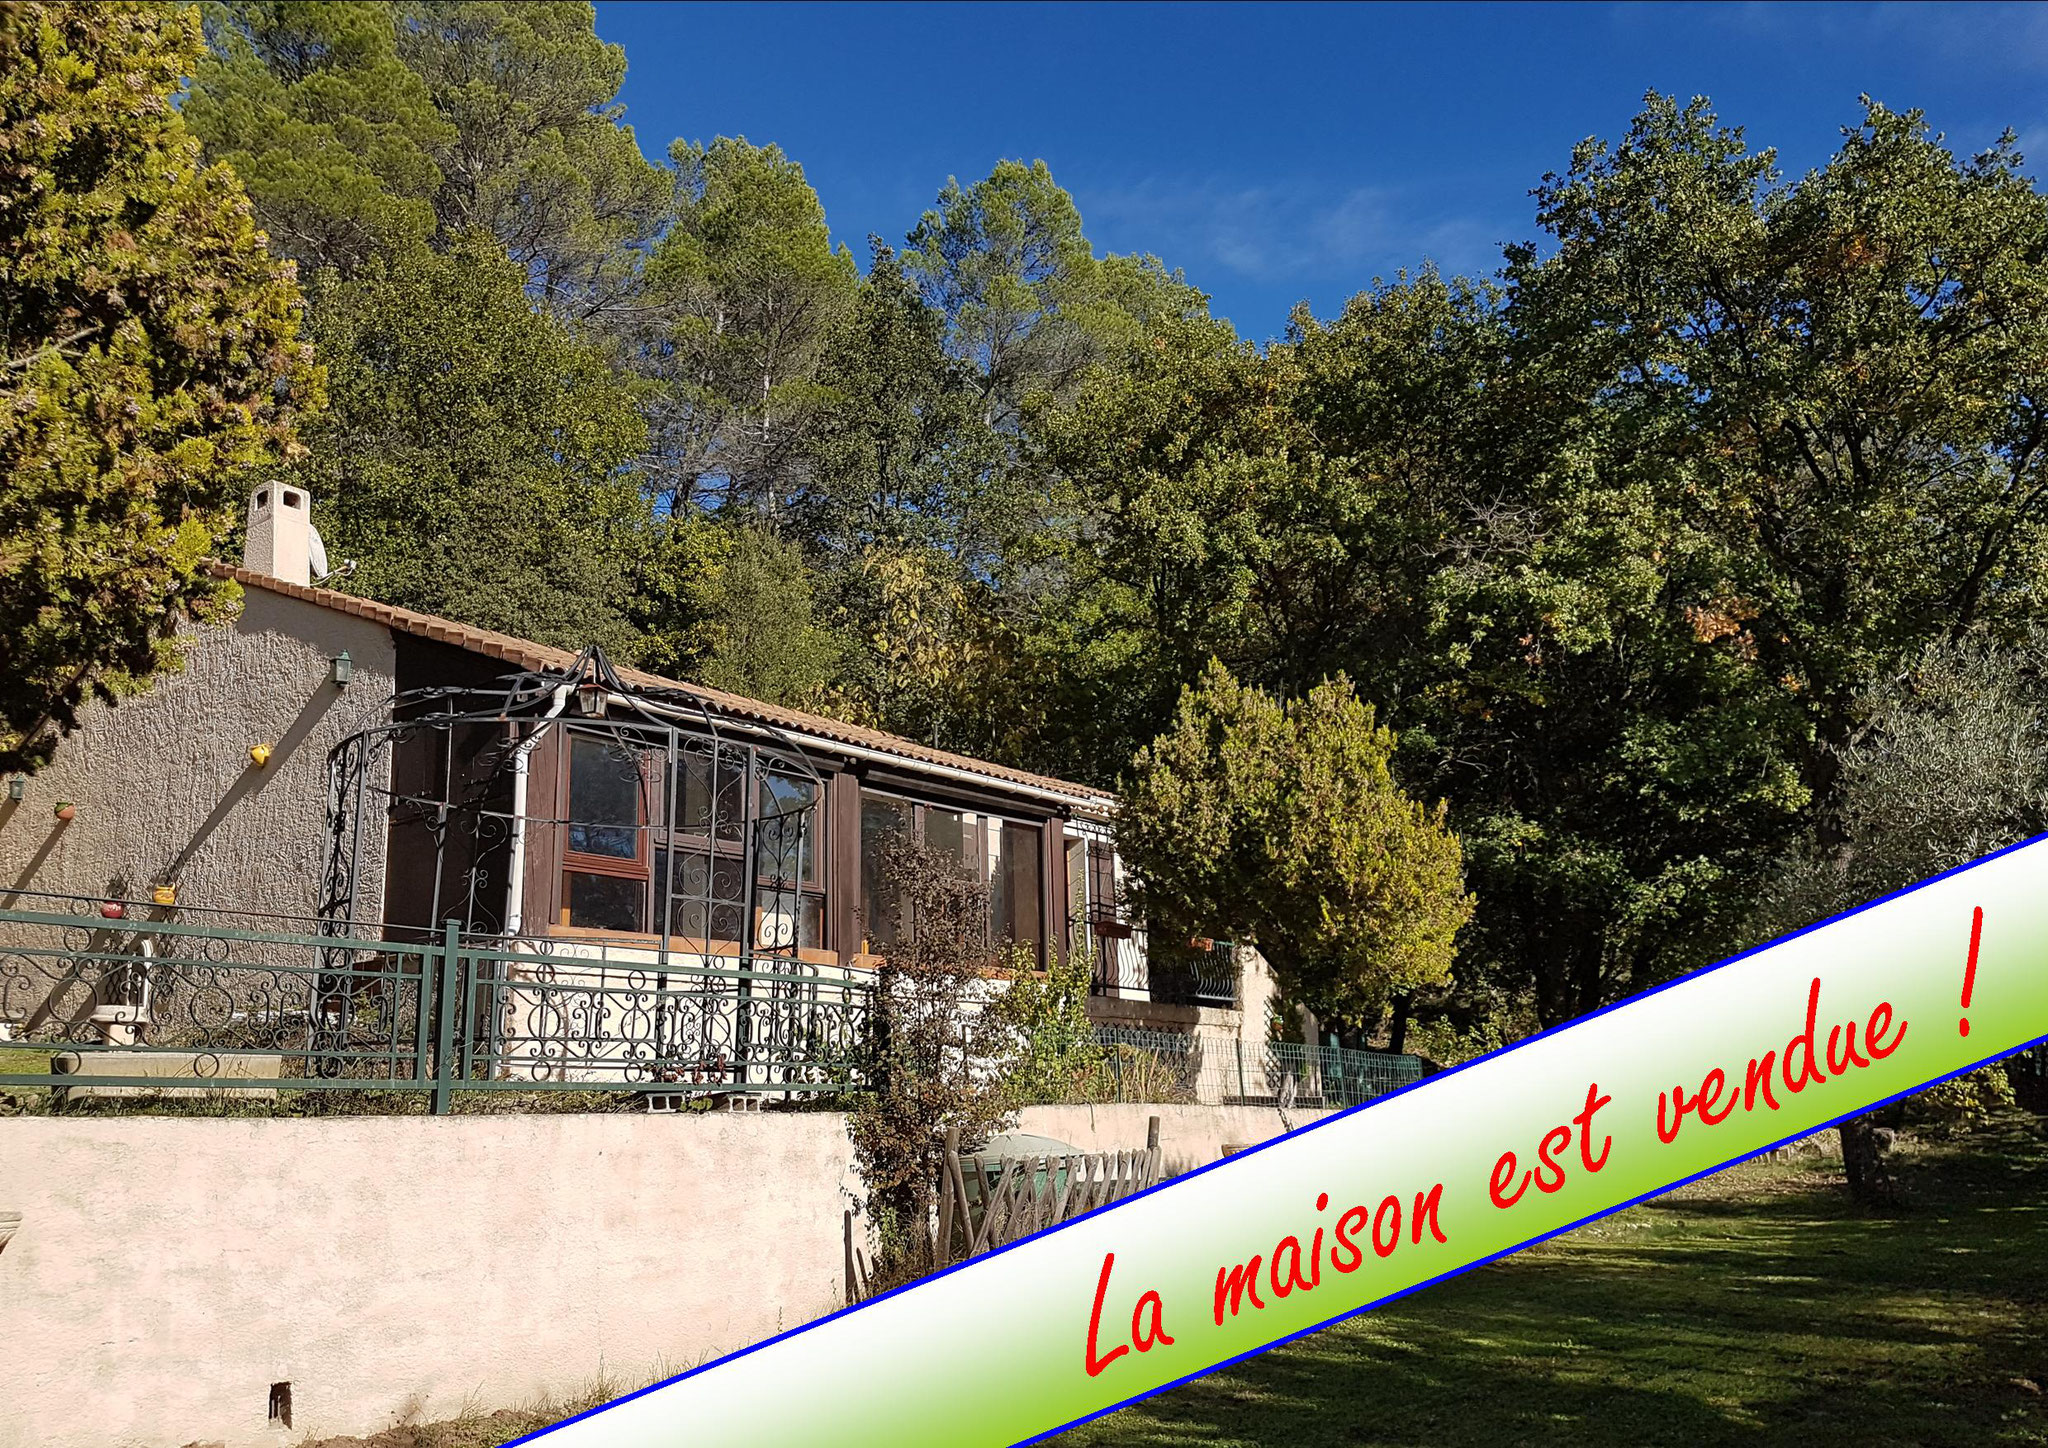 Flayosc - 210 000 € - 2 chambres - 81 m² - Terrain 4800 m²